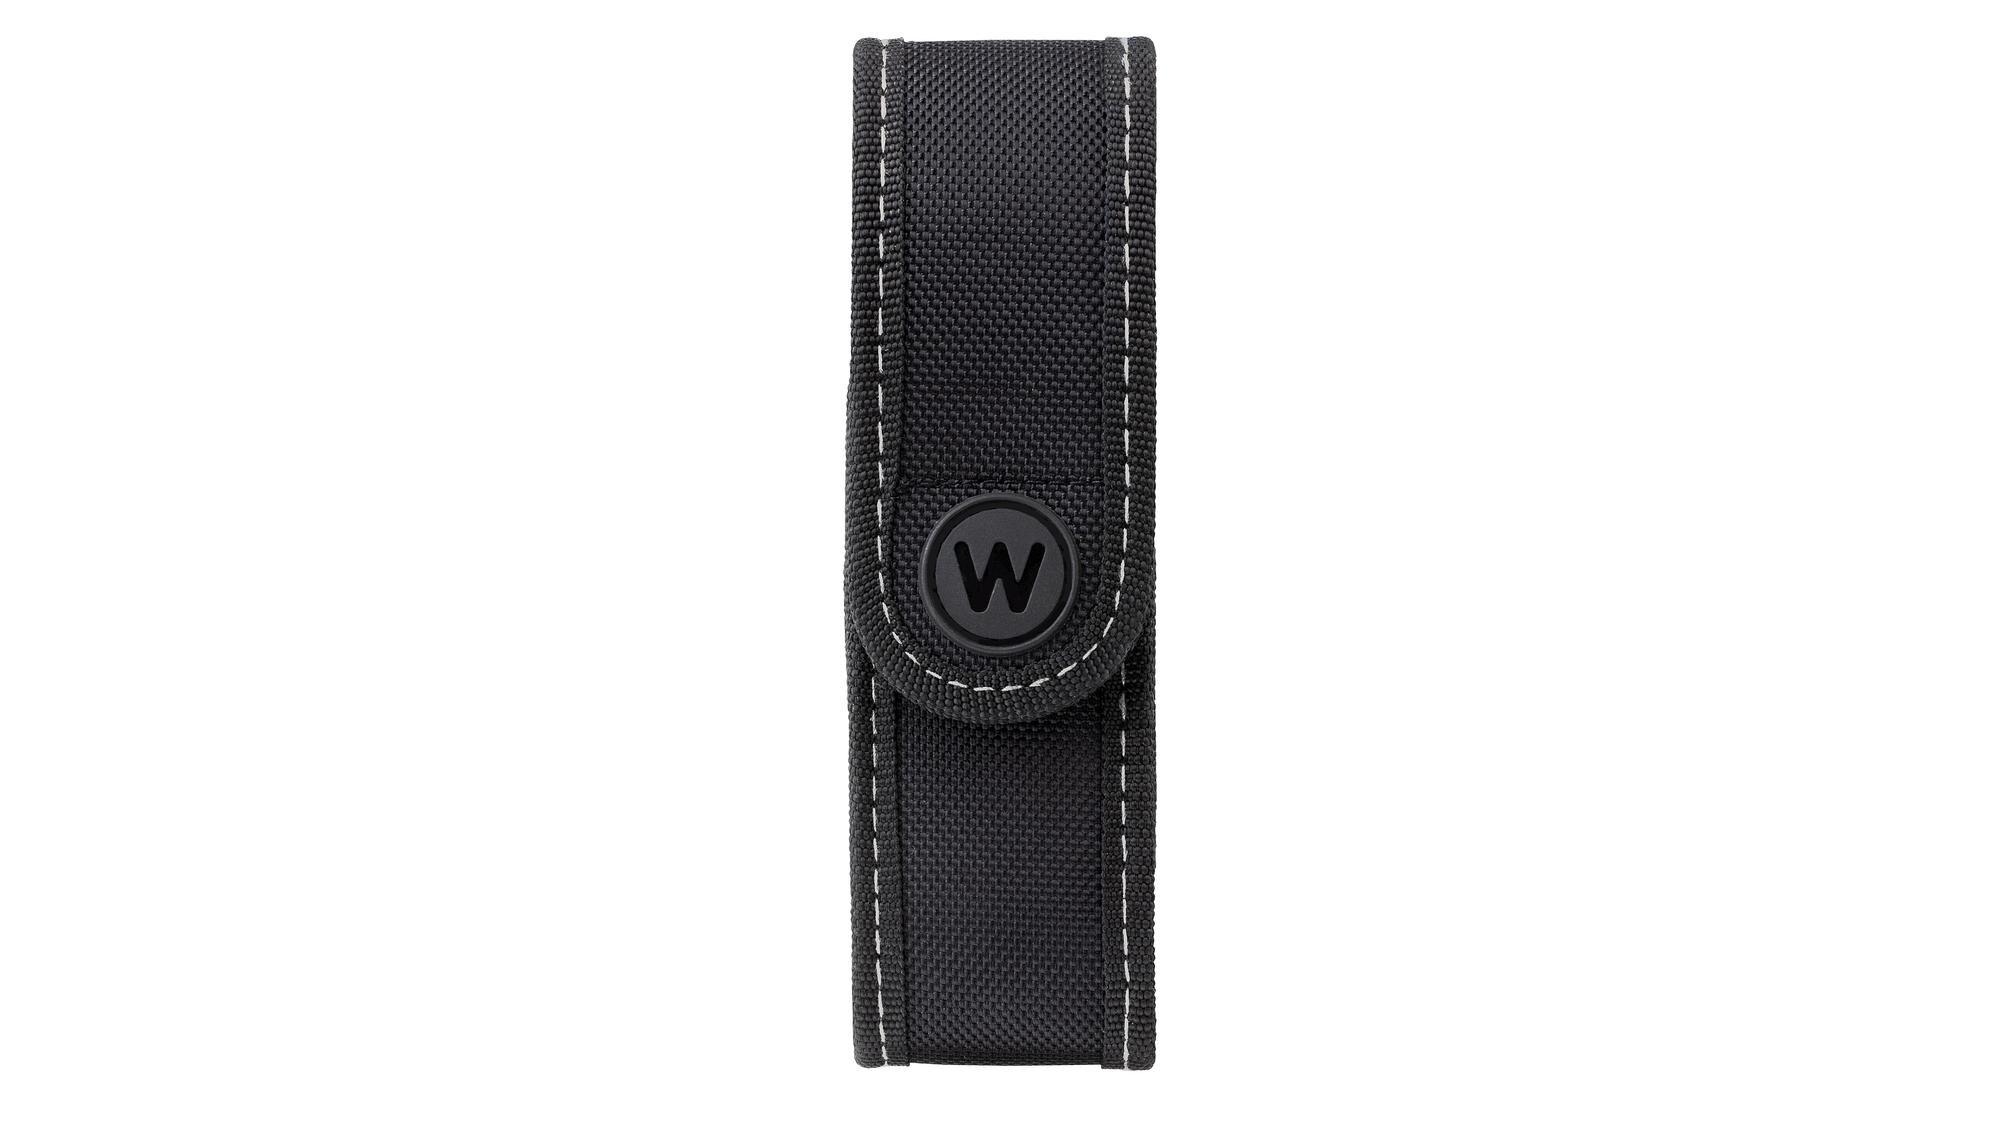 Puzdro na svietidlo L Walther® (Farba: Čierna)